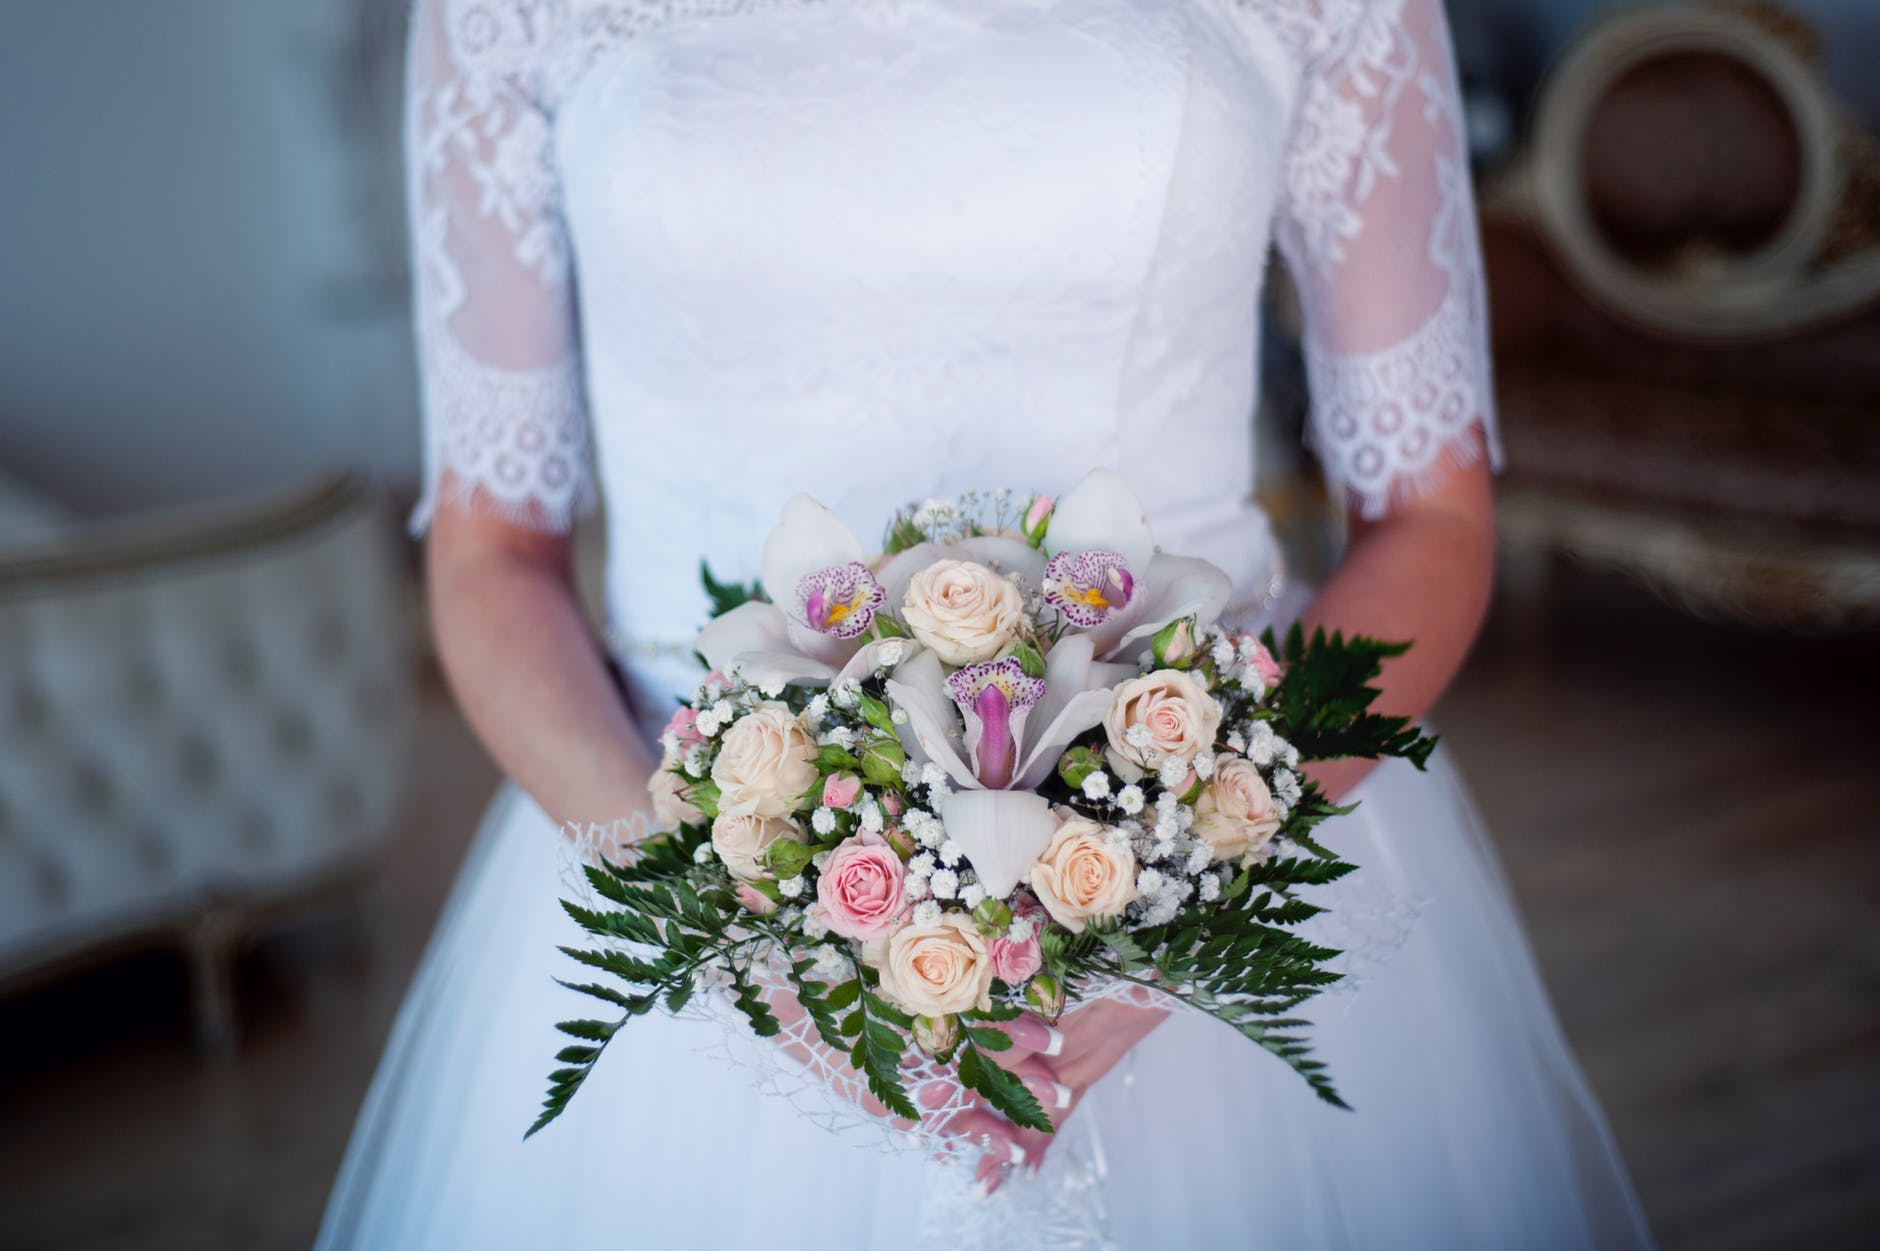 Bride holding round posy bouquet